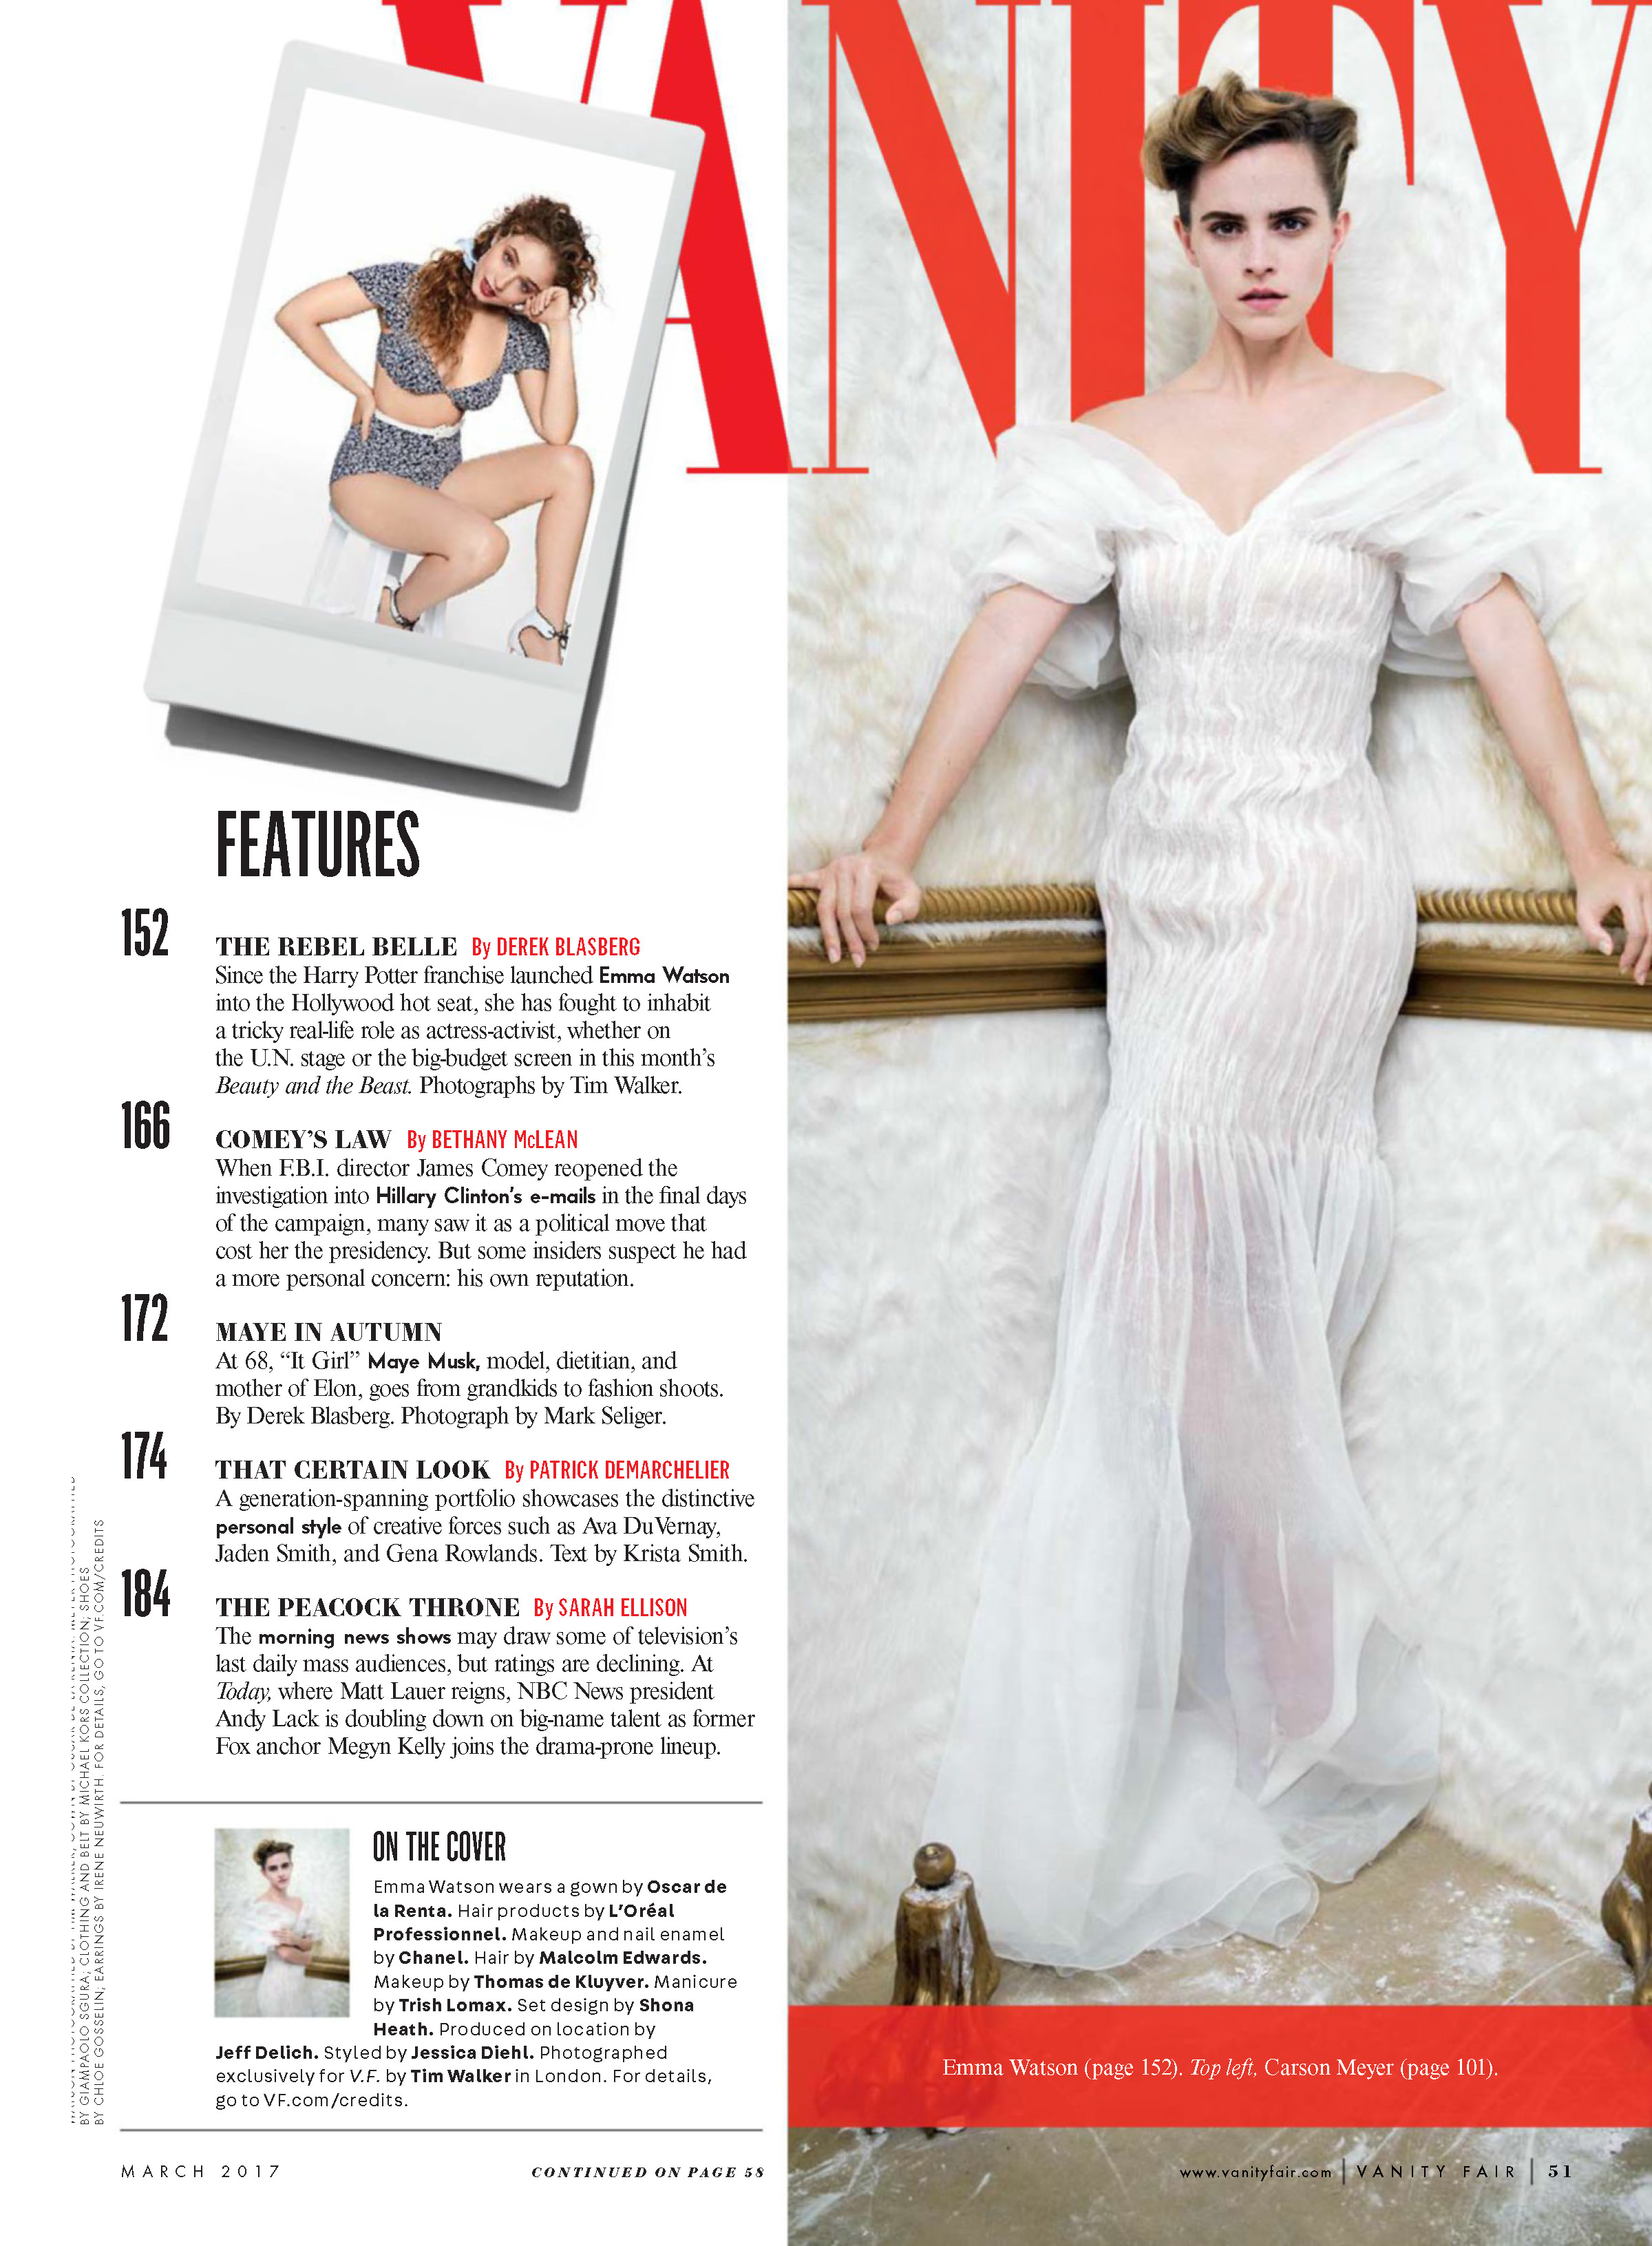 Emma Watson Page 85 Actresses Bellazon